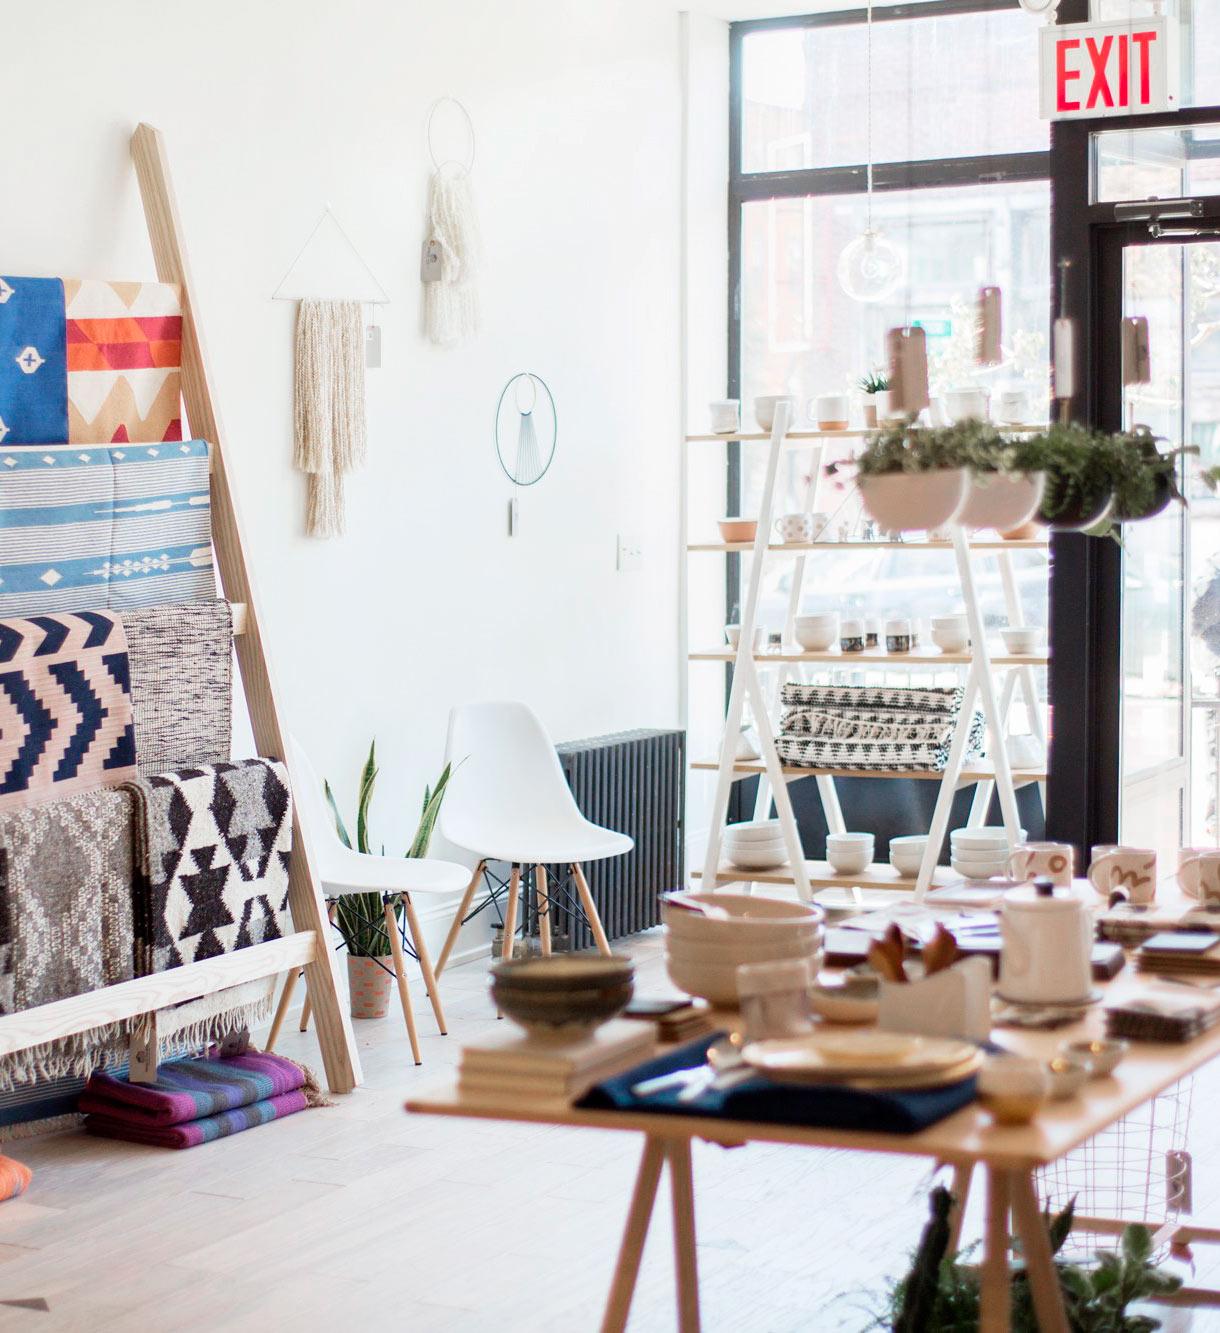 Mi lista de tiendas de decoraci n favoritas decoraci n online para tu casa blog decoraci n - Decoracion on line ...